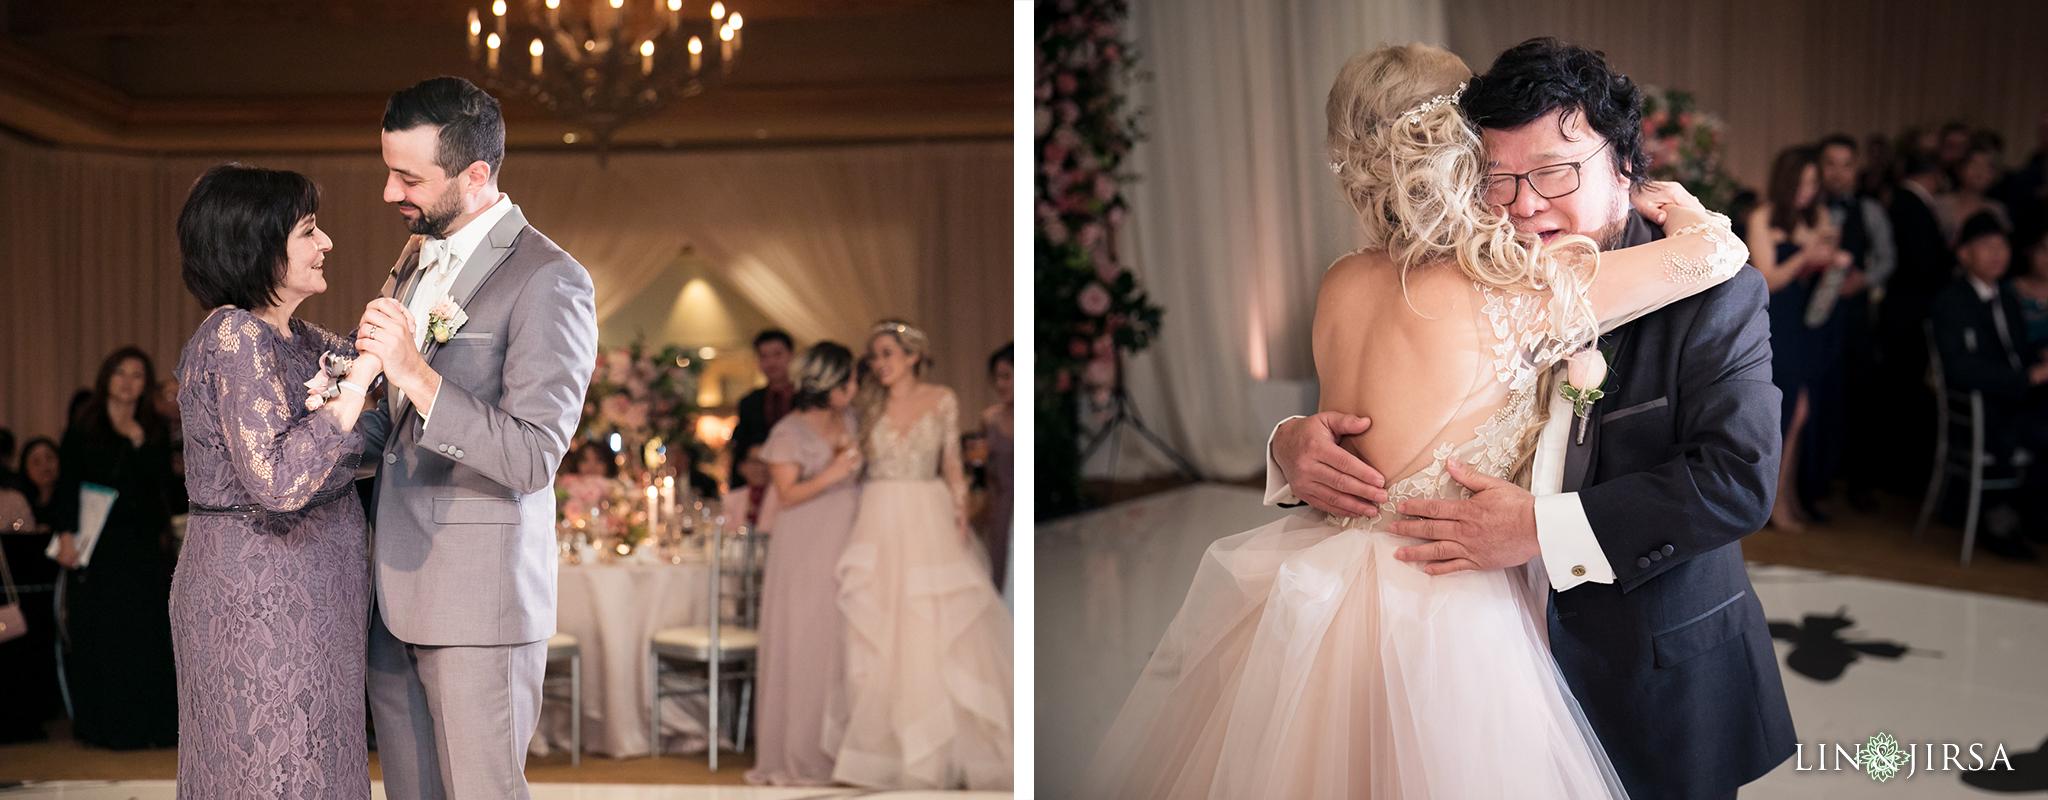 42-pelican-hill-resort-orange-county-wedding-photography